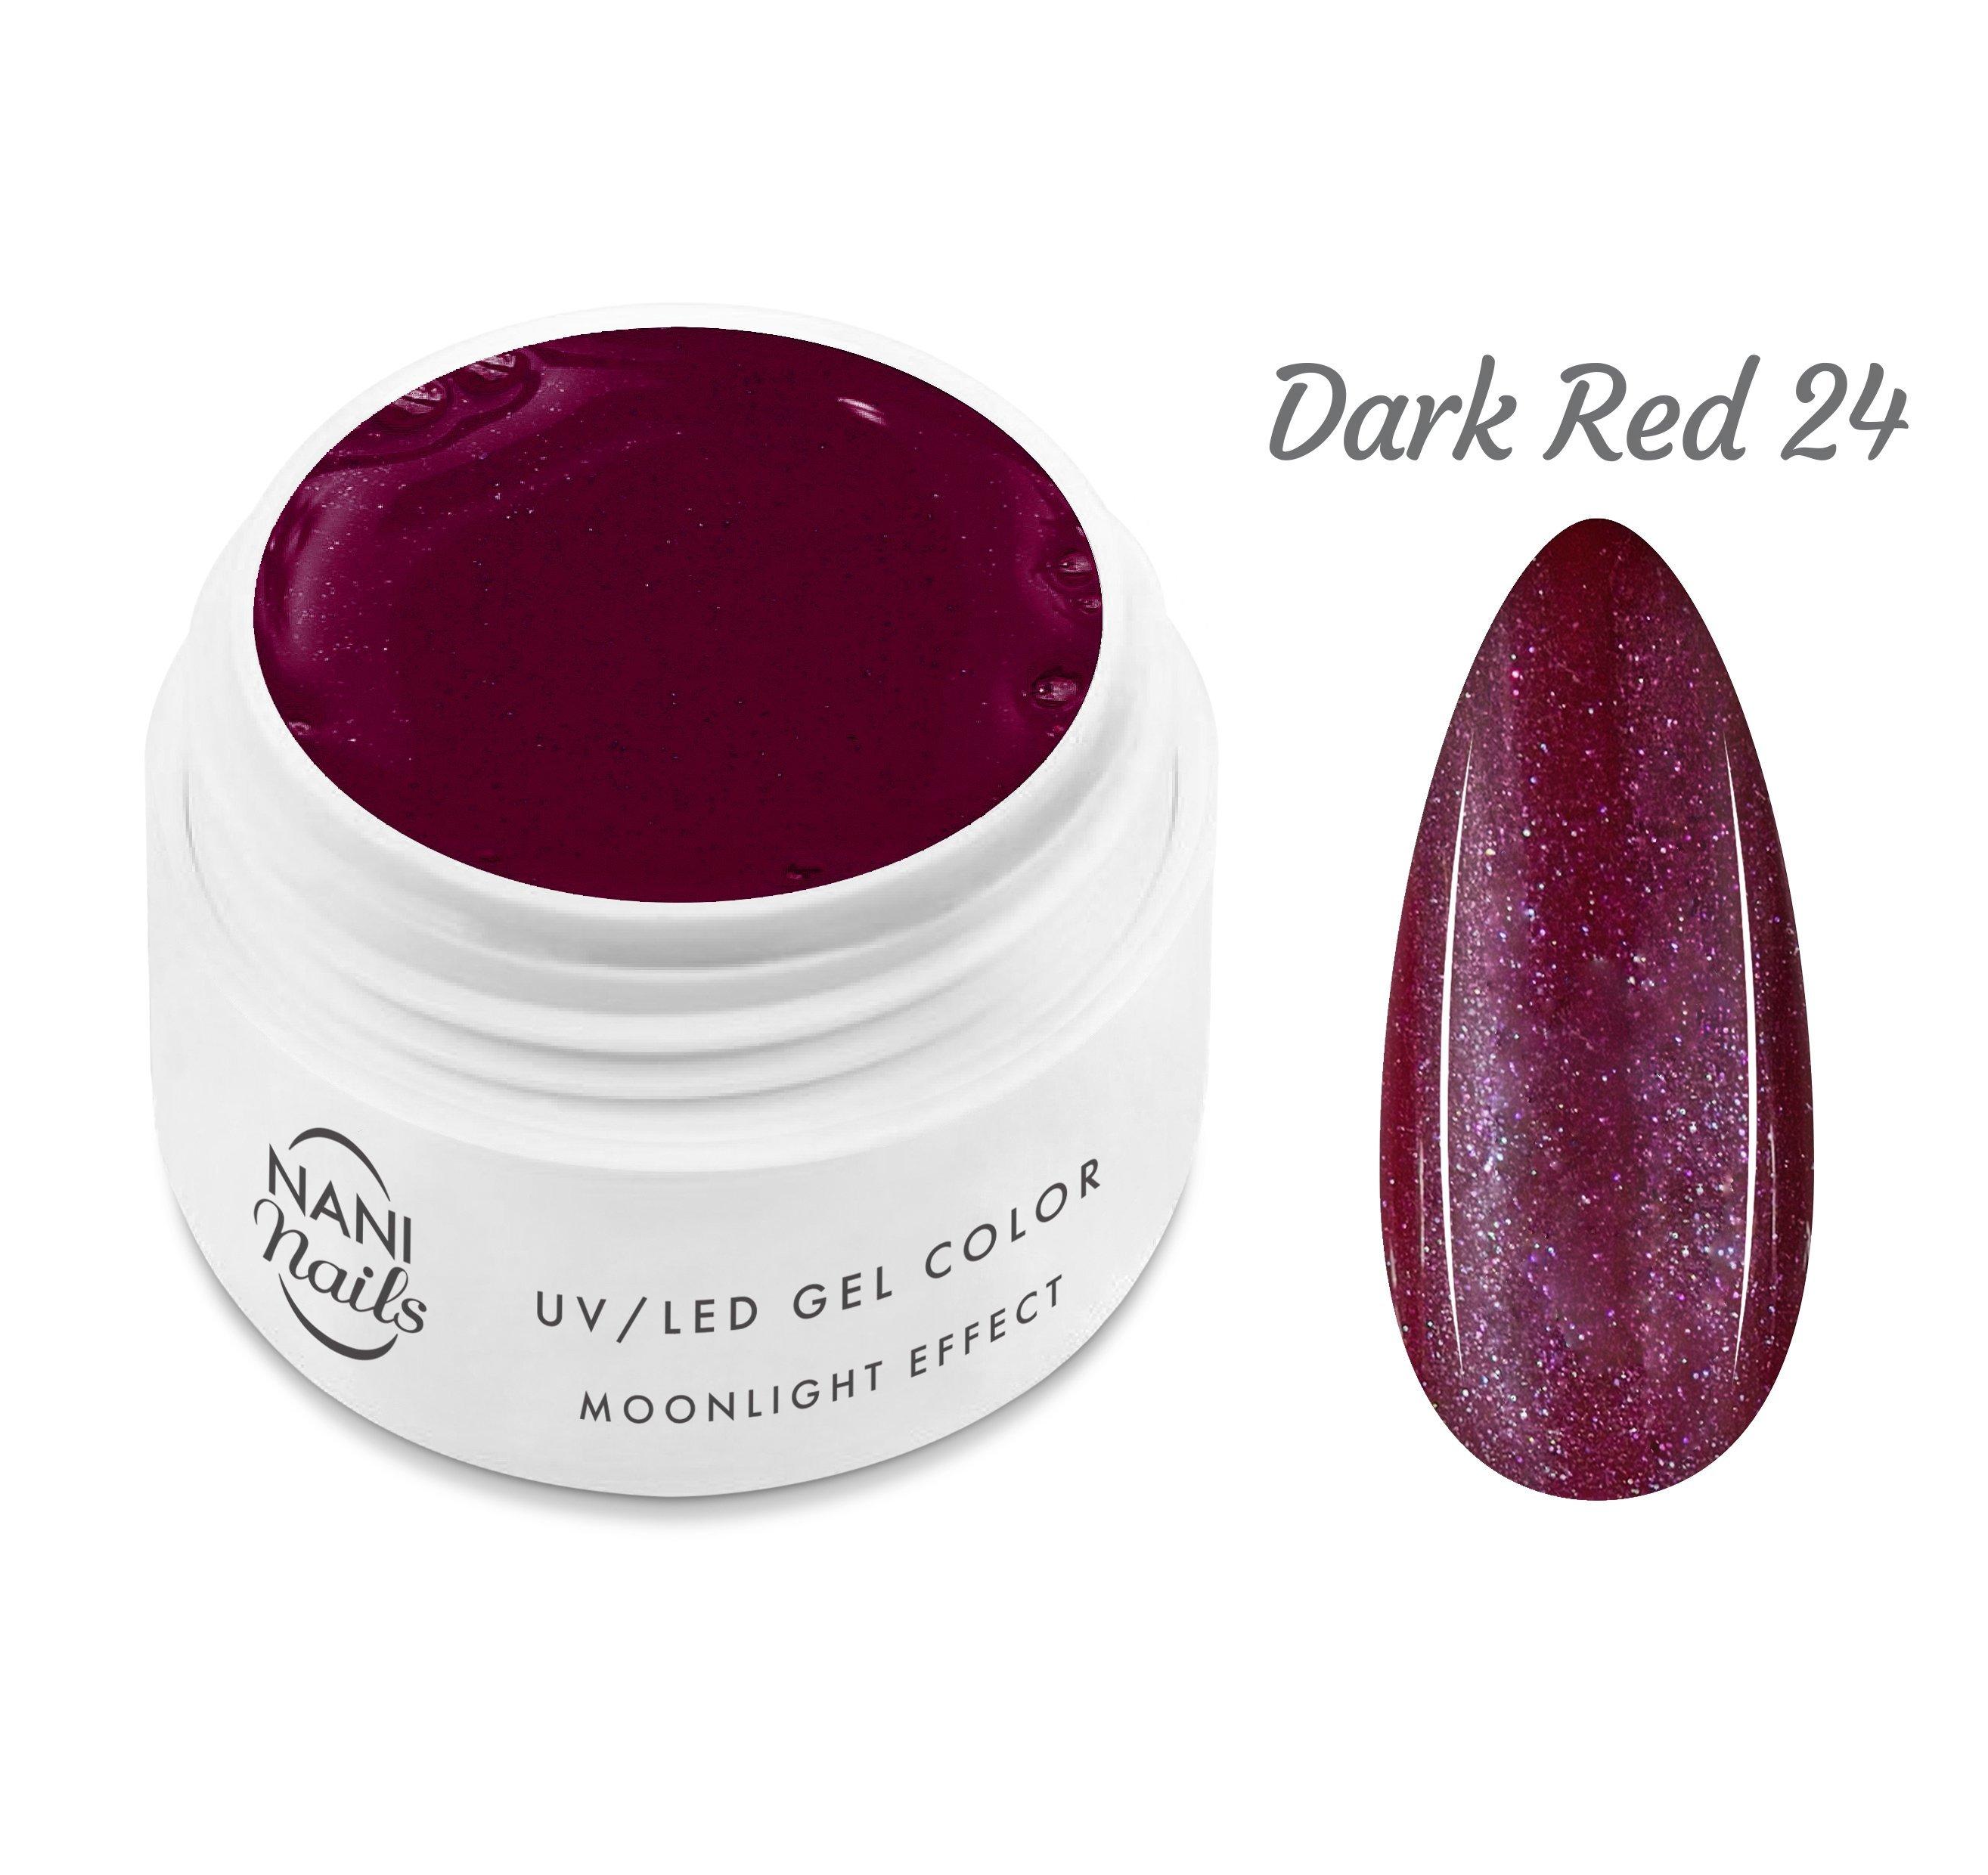 NANI UV gél Moonlight Effect 5 ml - Dark Red